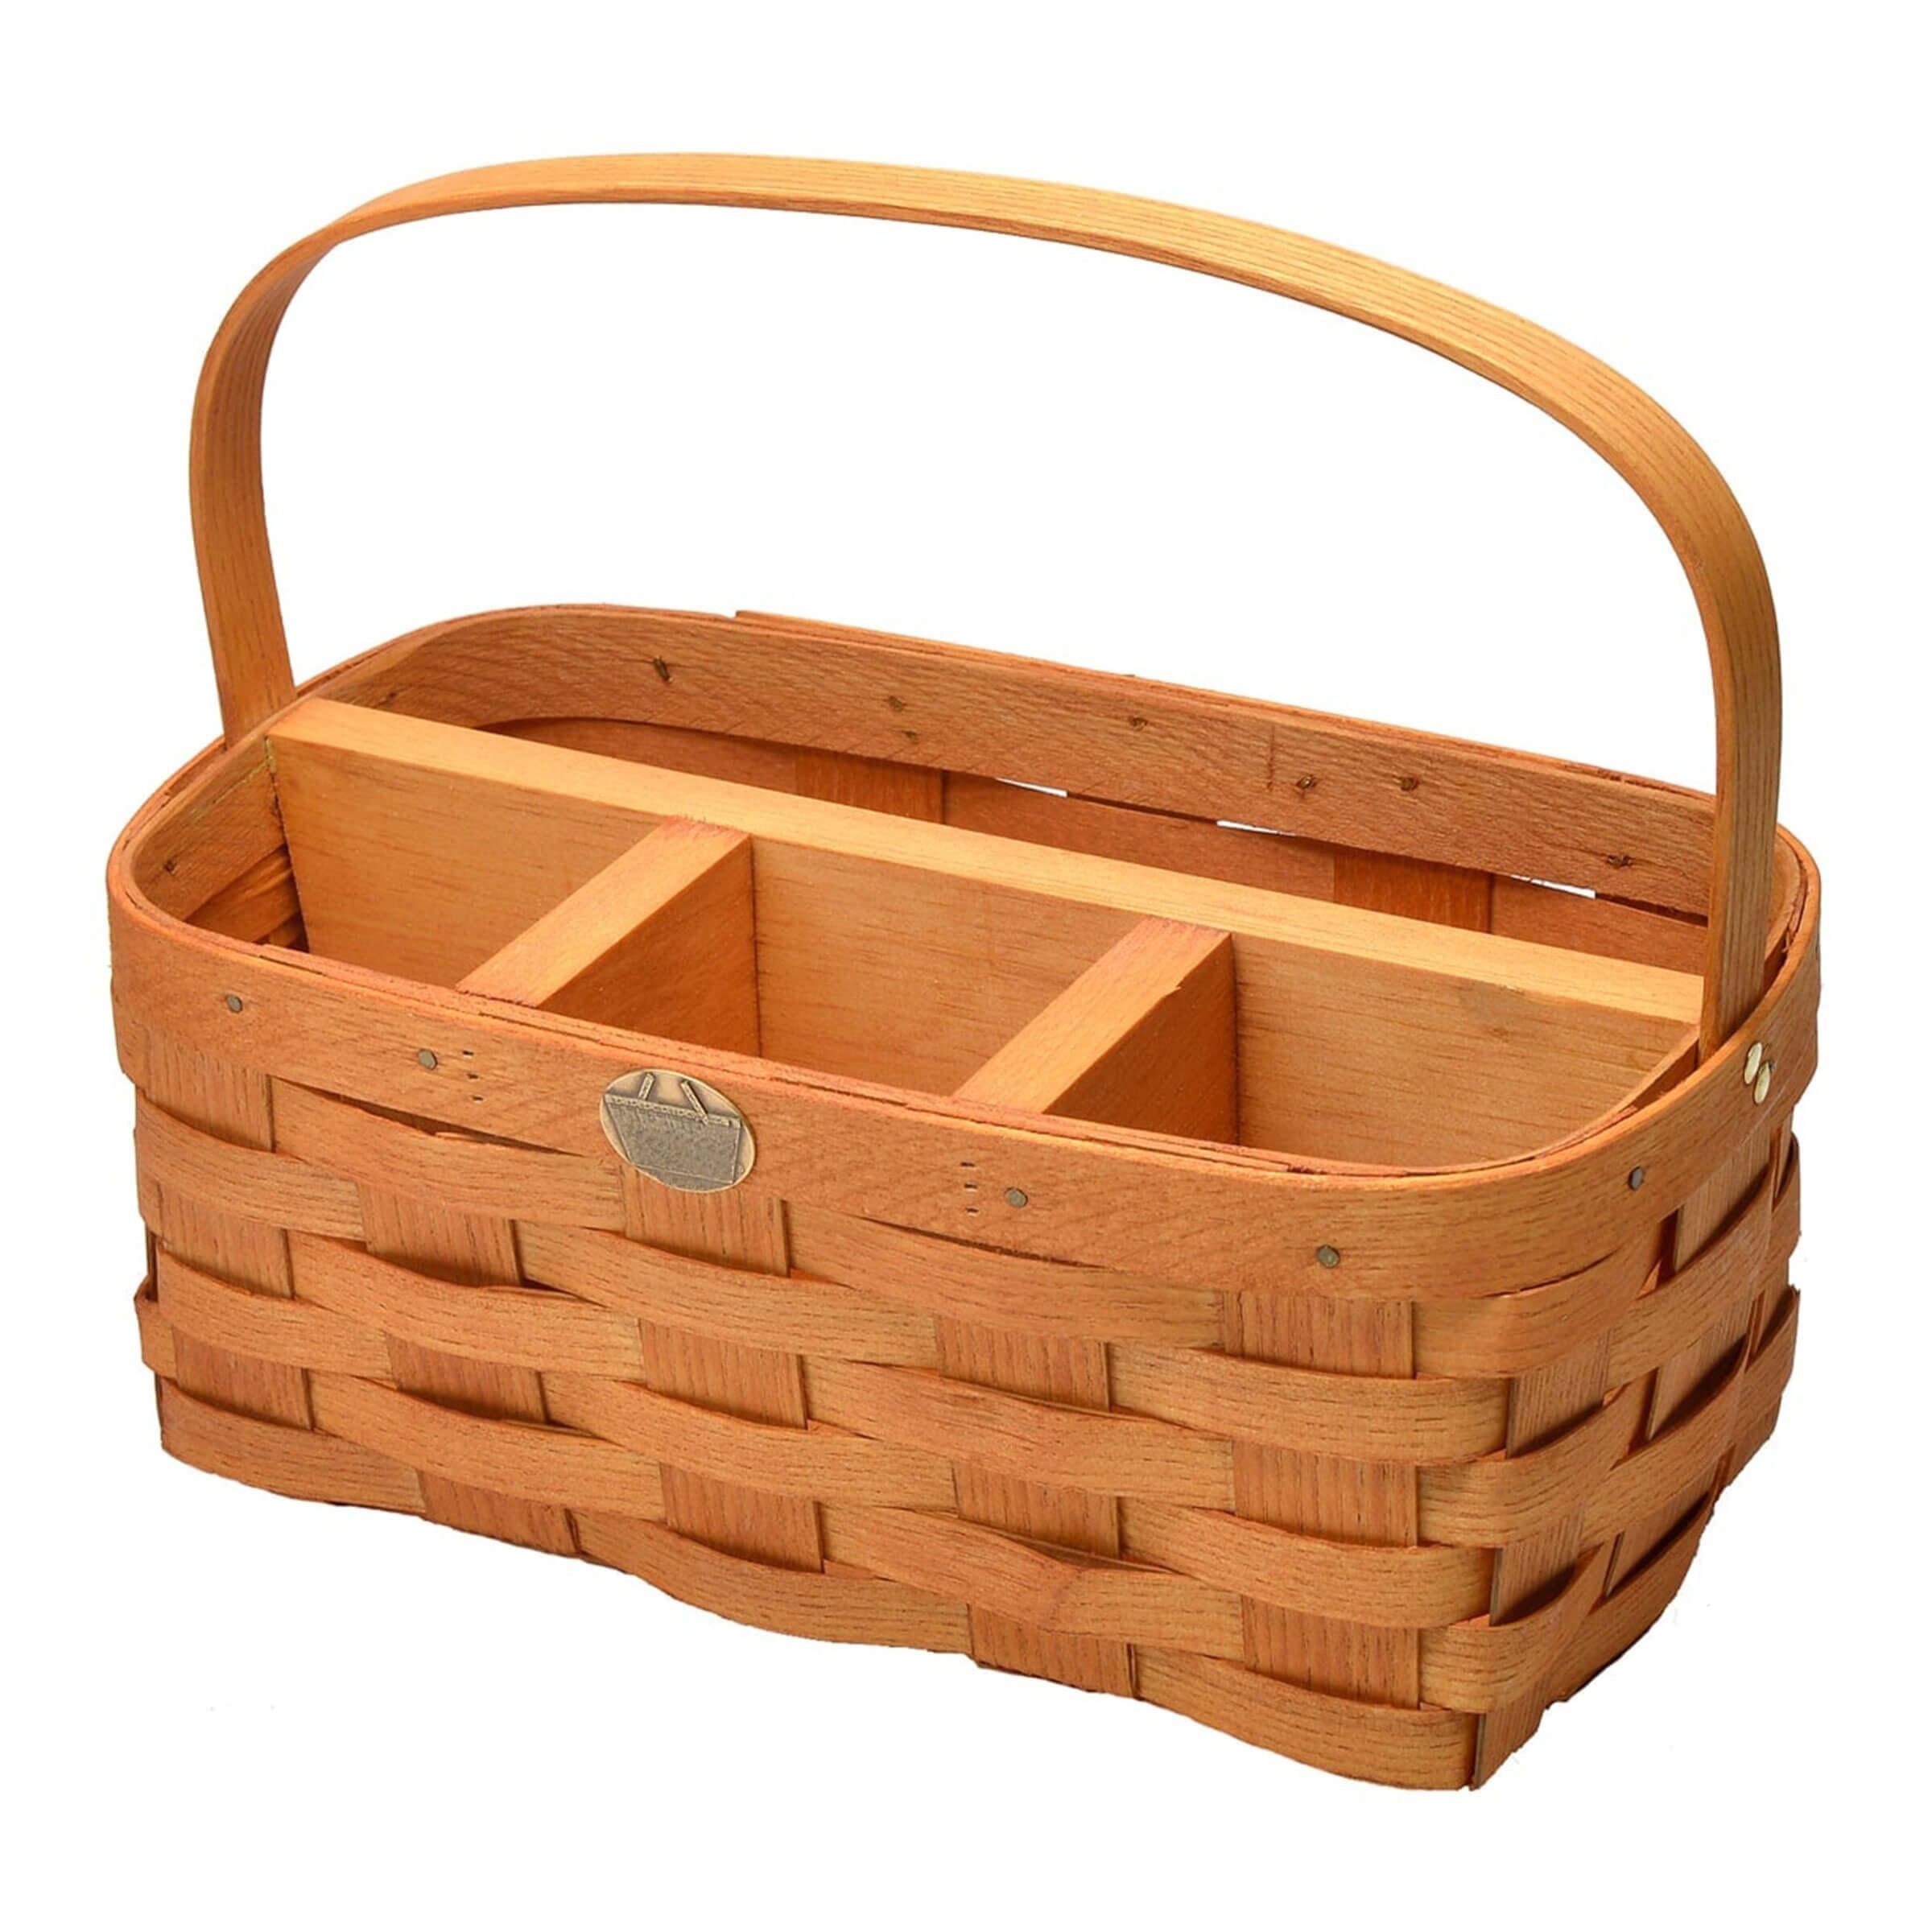 Baskets - Liberty Tabletop